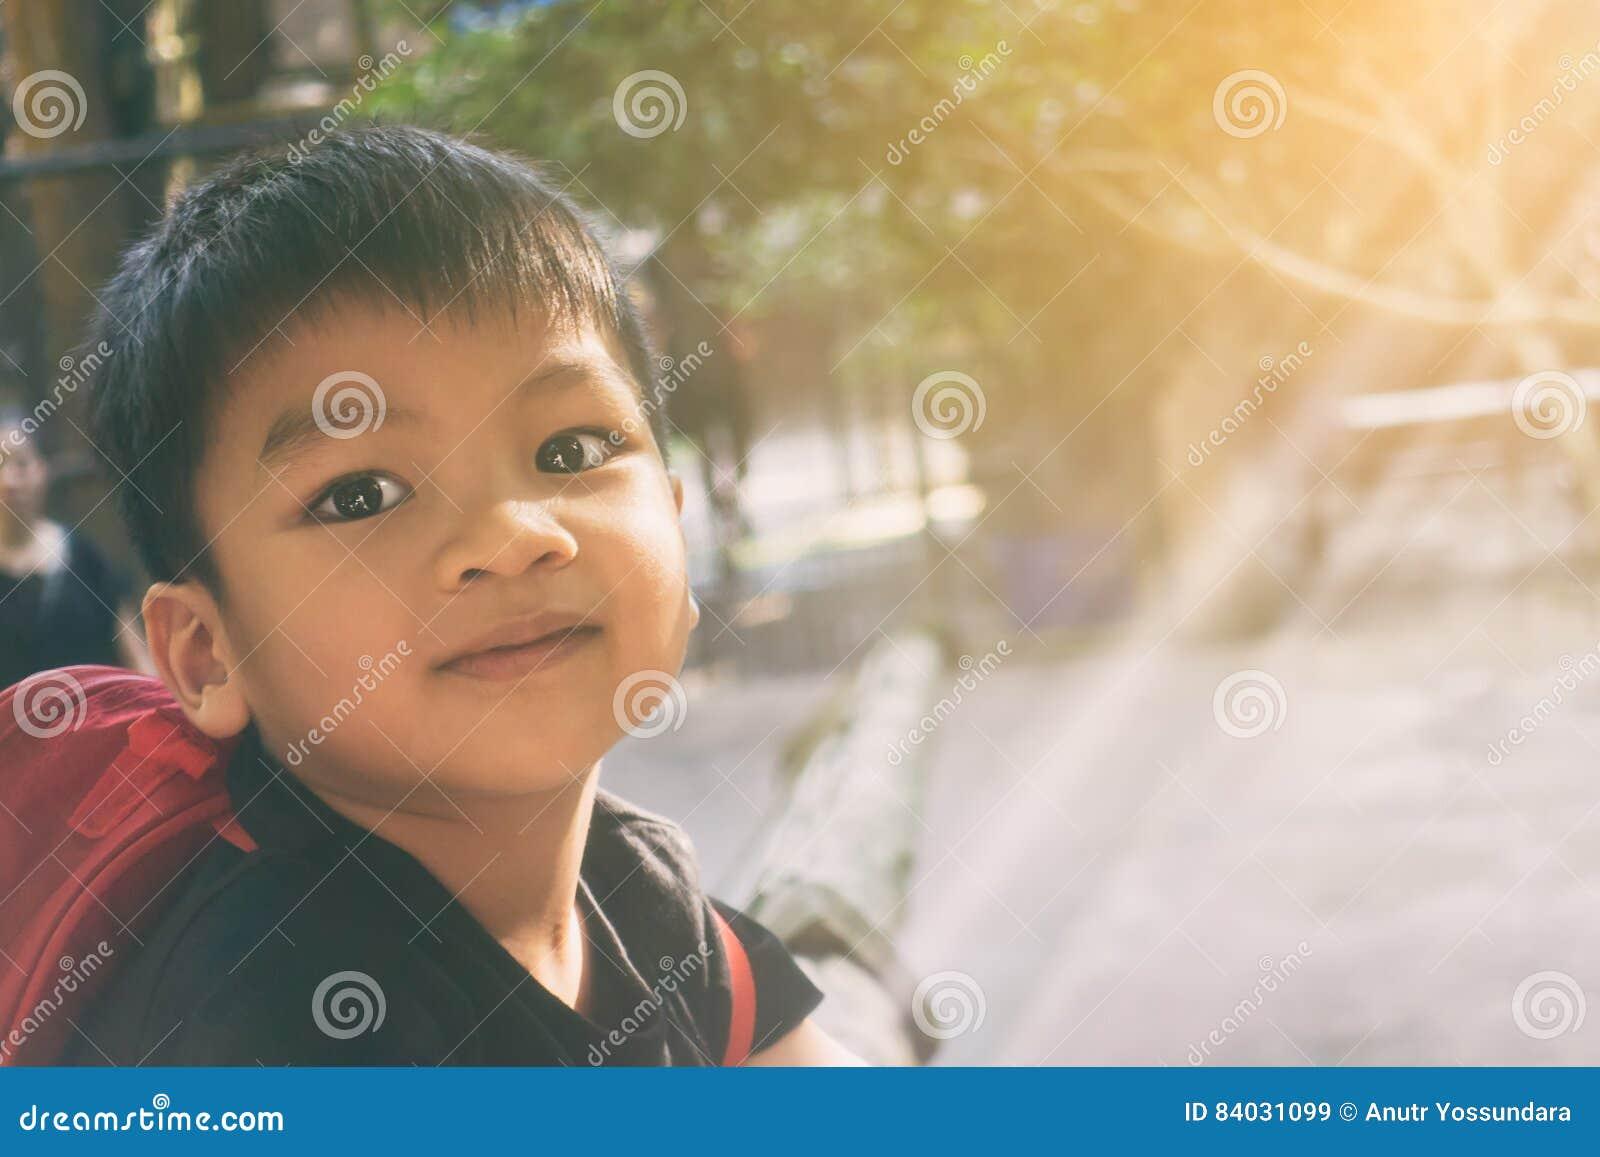 Asian sunshine facial